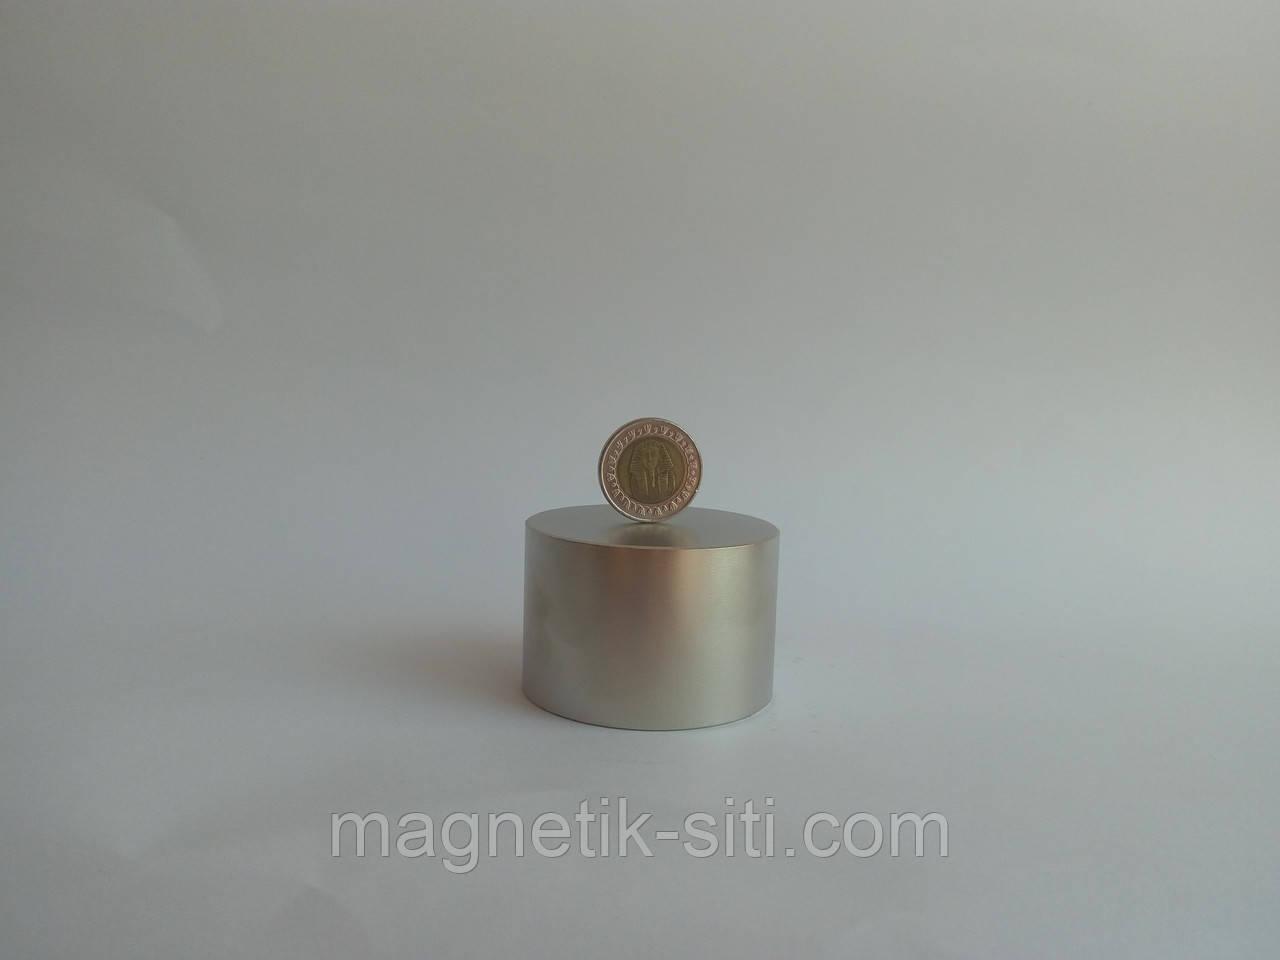 Магнит неодимовый 60*40 N42